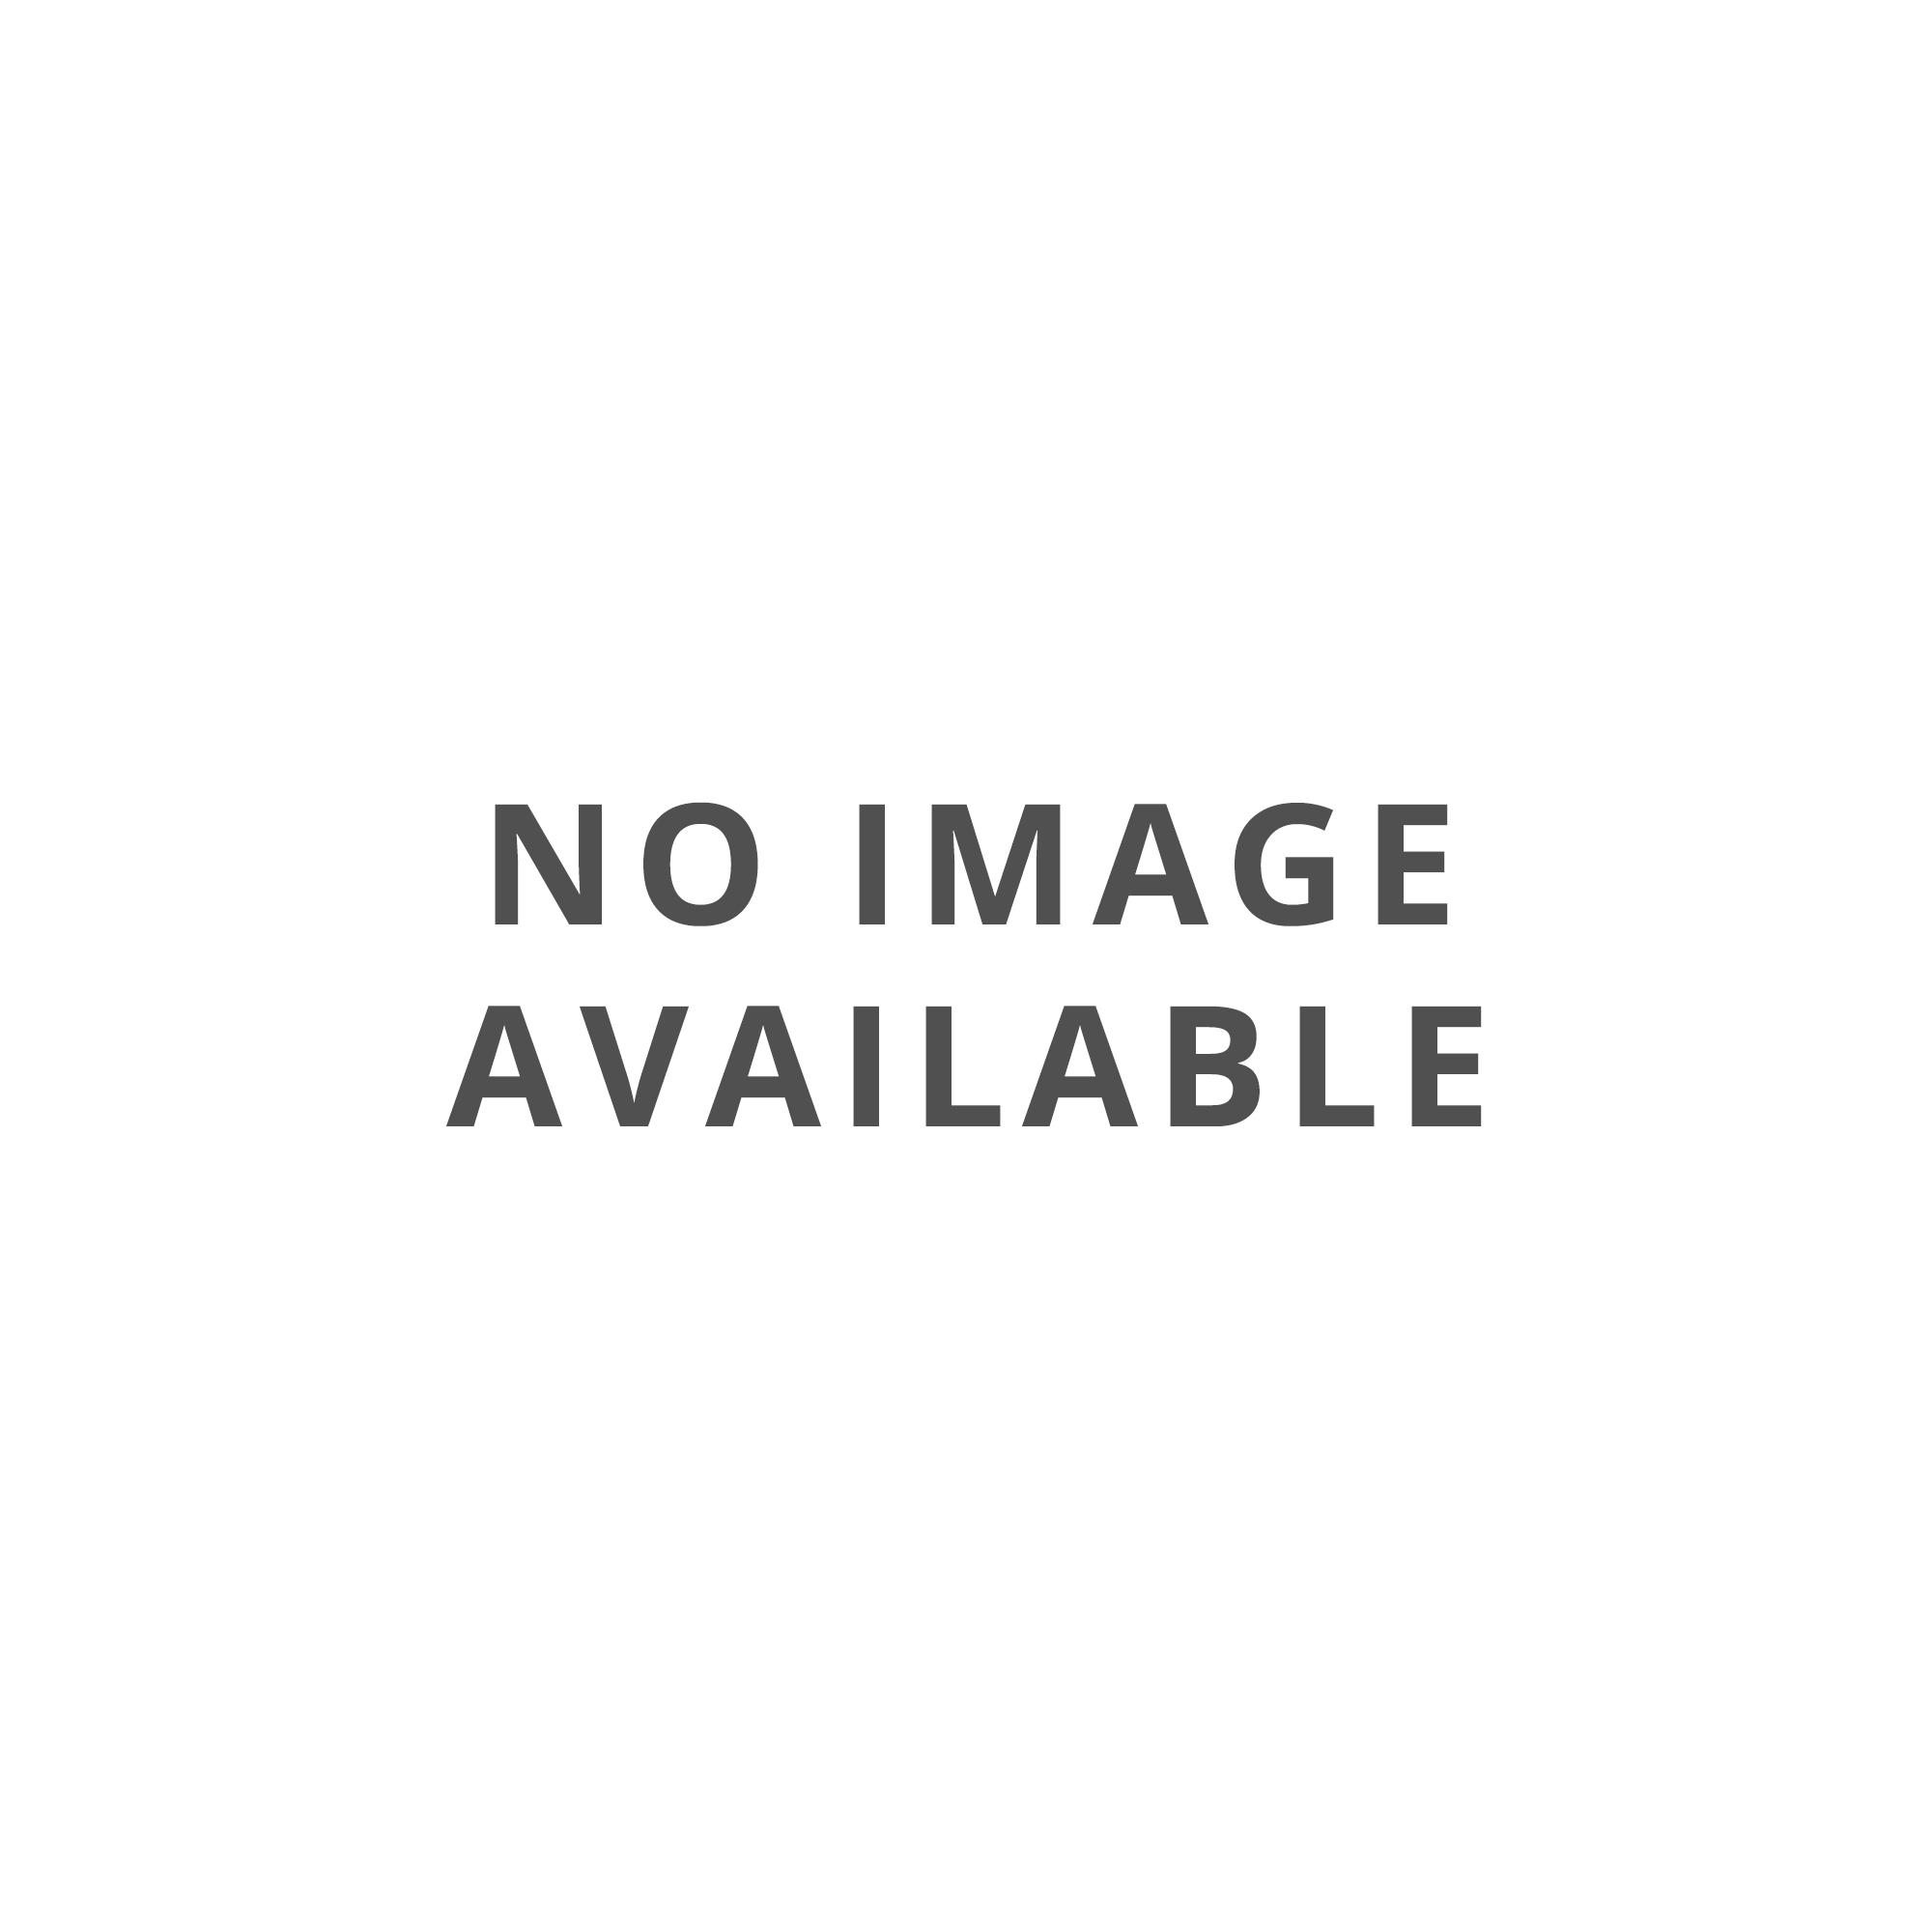 Astini Provencale Antique Bronze Twin Lever Kitchen Sink Bridge Mixer Tap